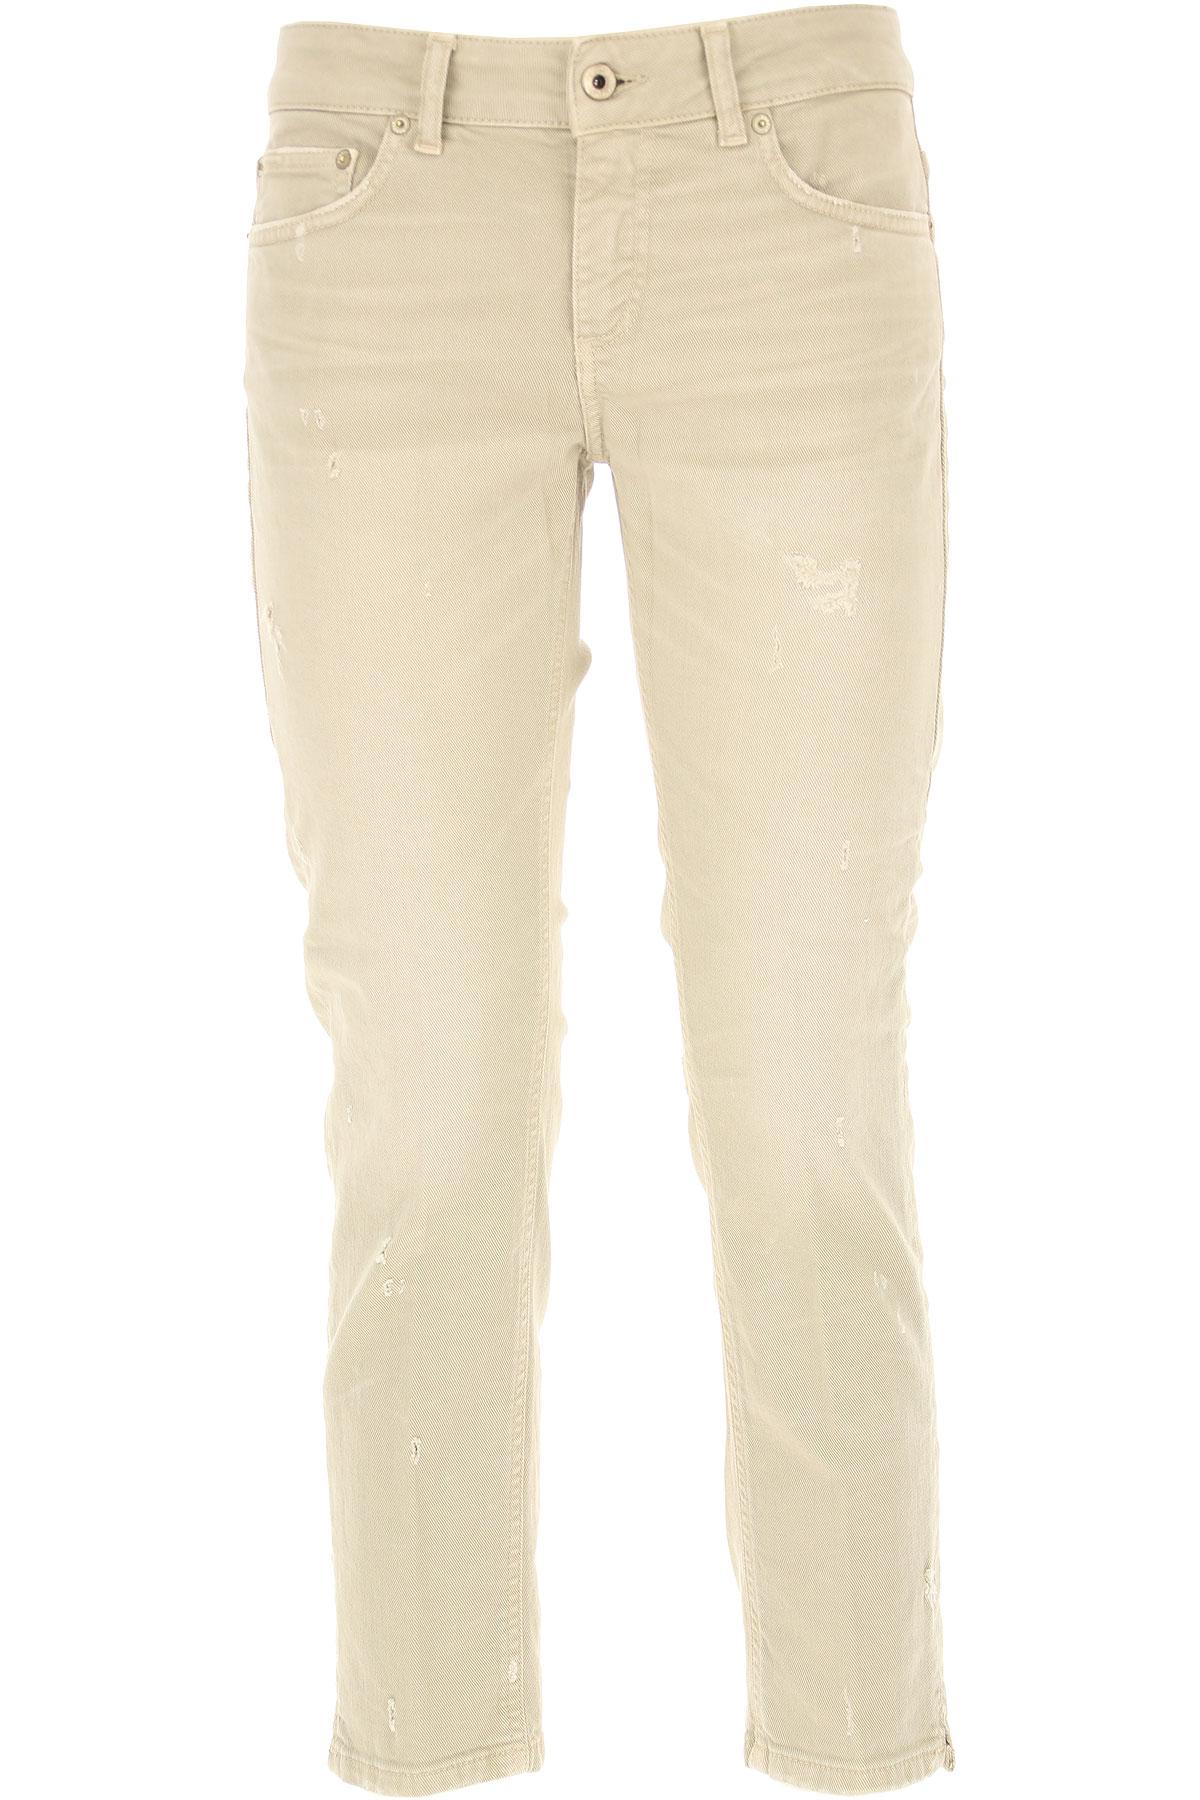 Dondup Jeans, Beige, Cotton, 2017, 26 27 28 29 30